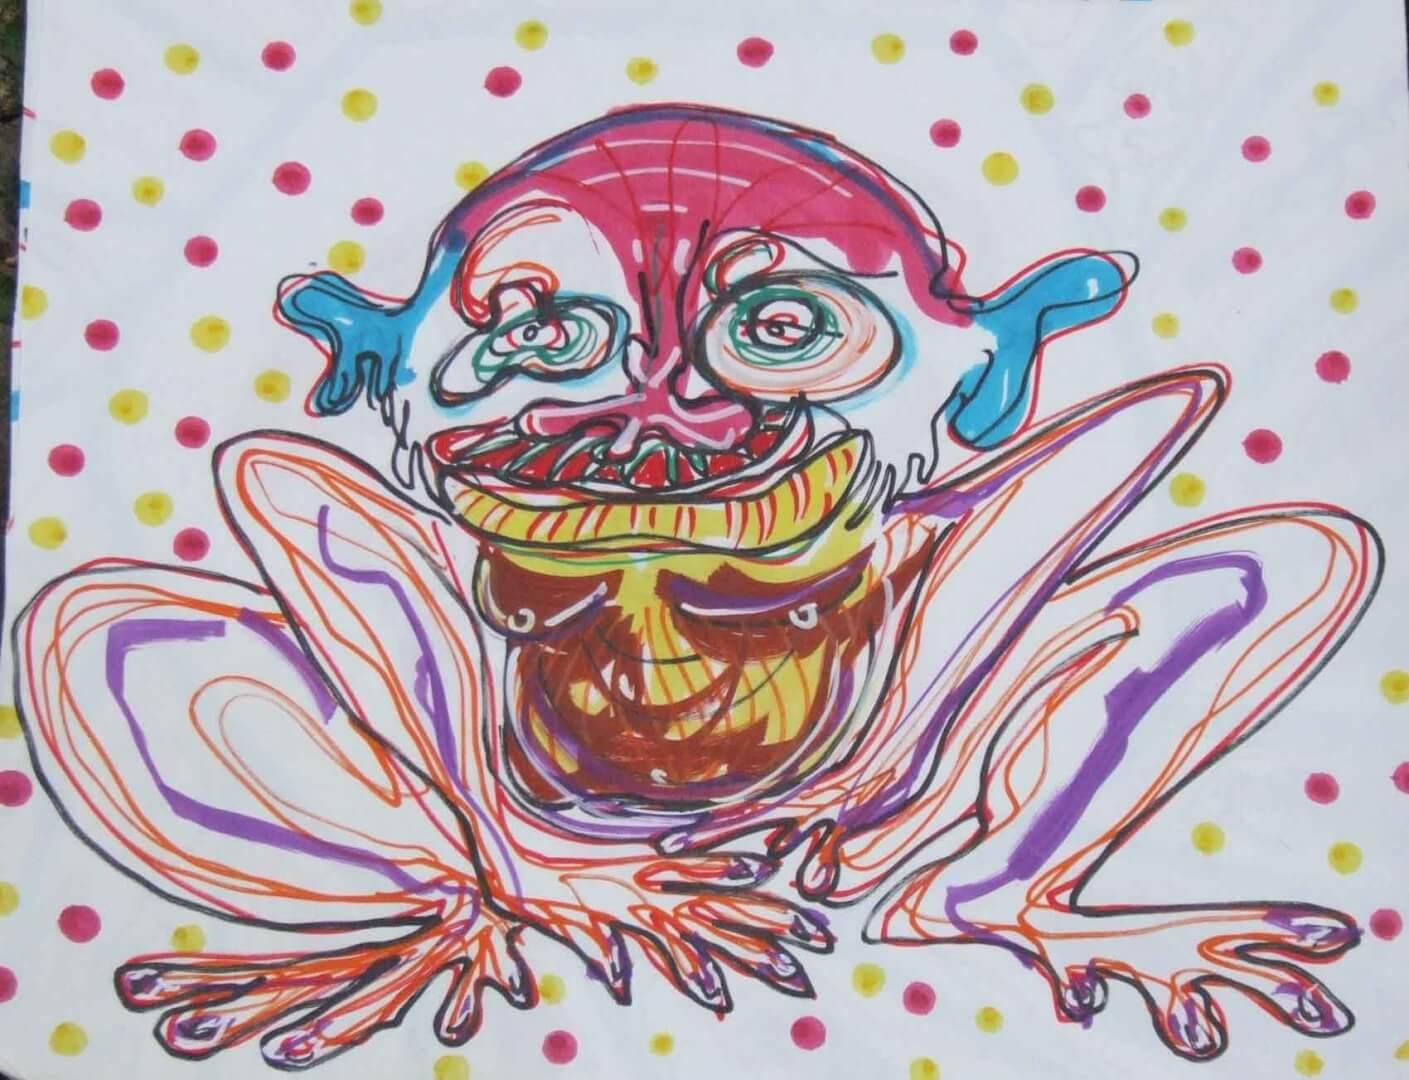 Singe grenouille © David Noir | Dessins, peintures, collages